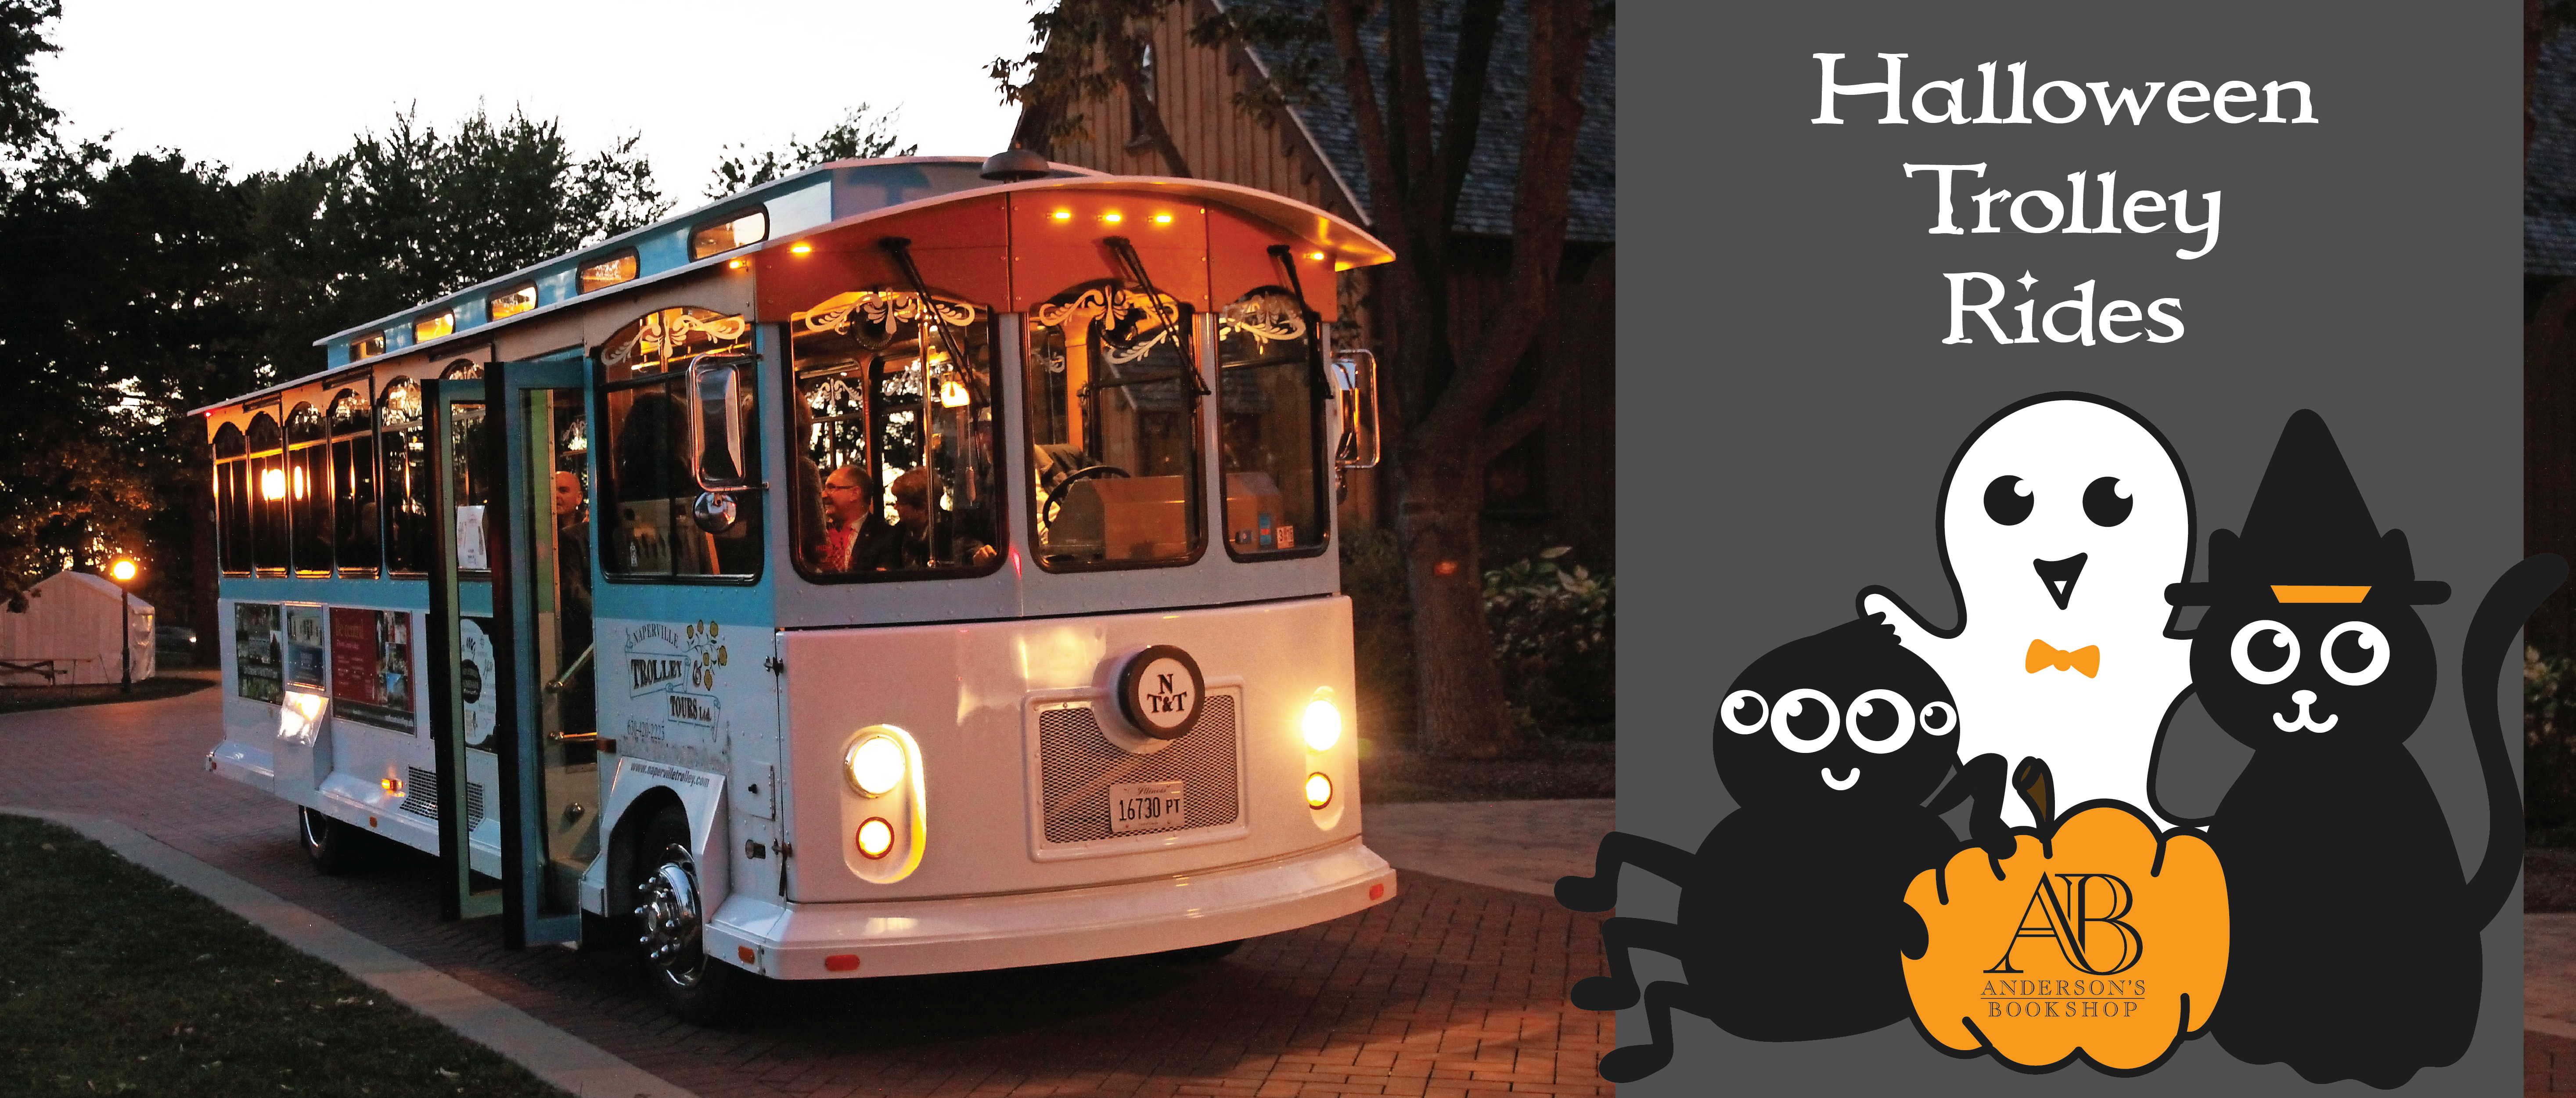 Halloween Trolley Rides